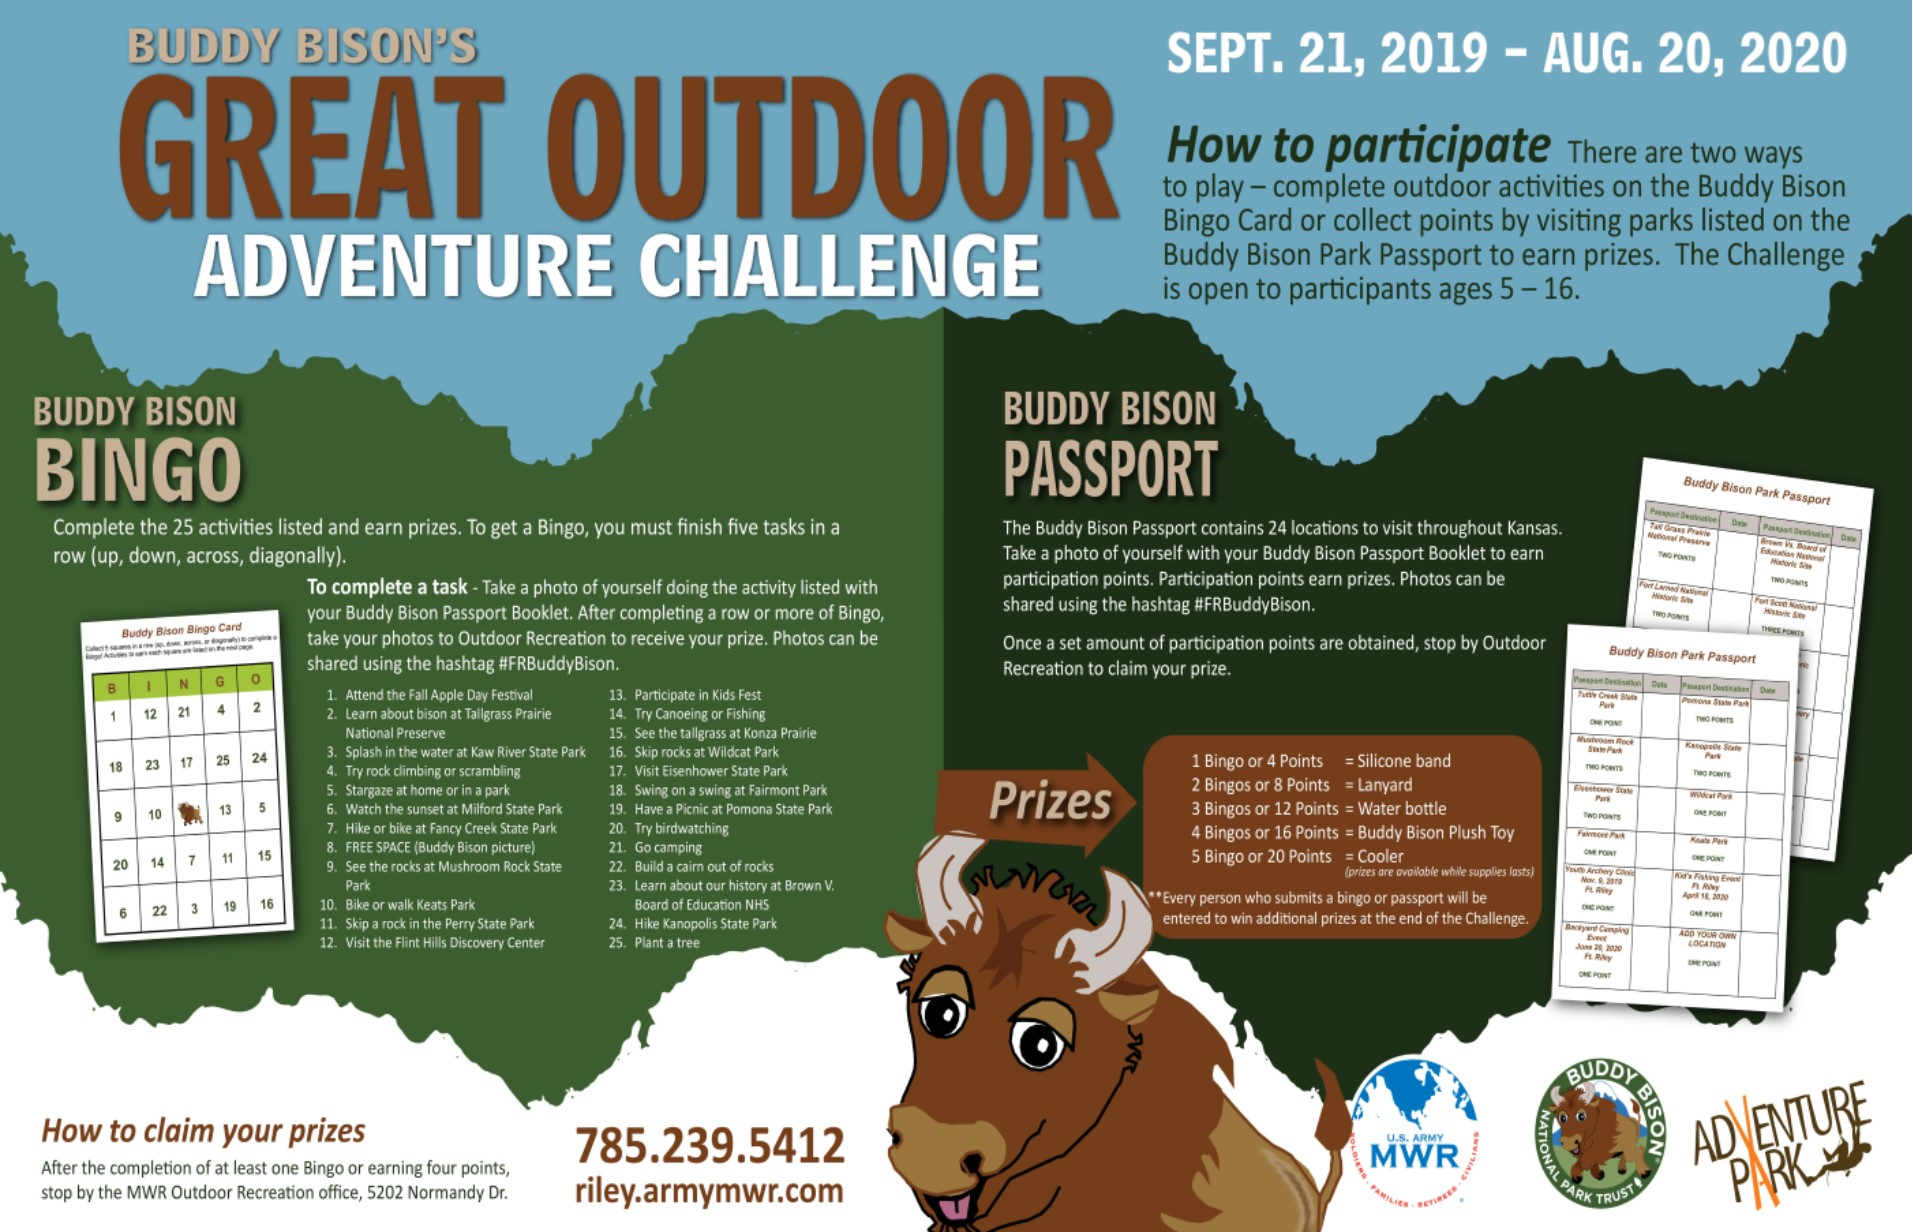 Buddy Bison's Great Outdoor Challenge